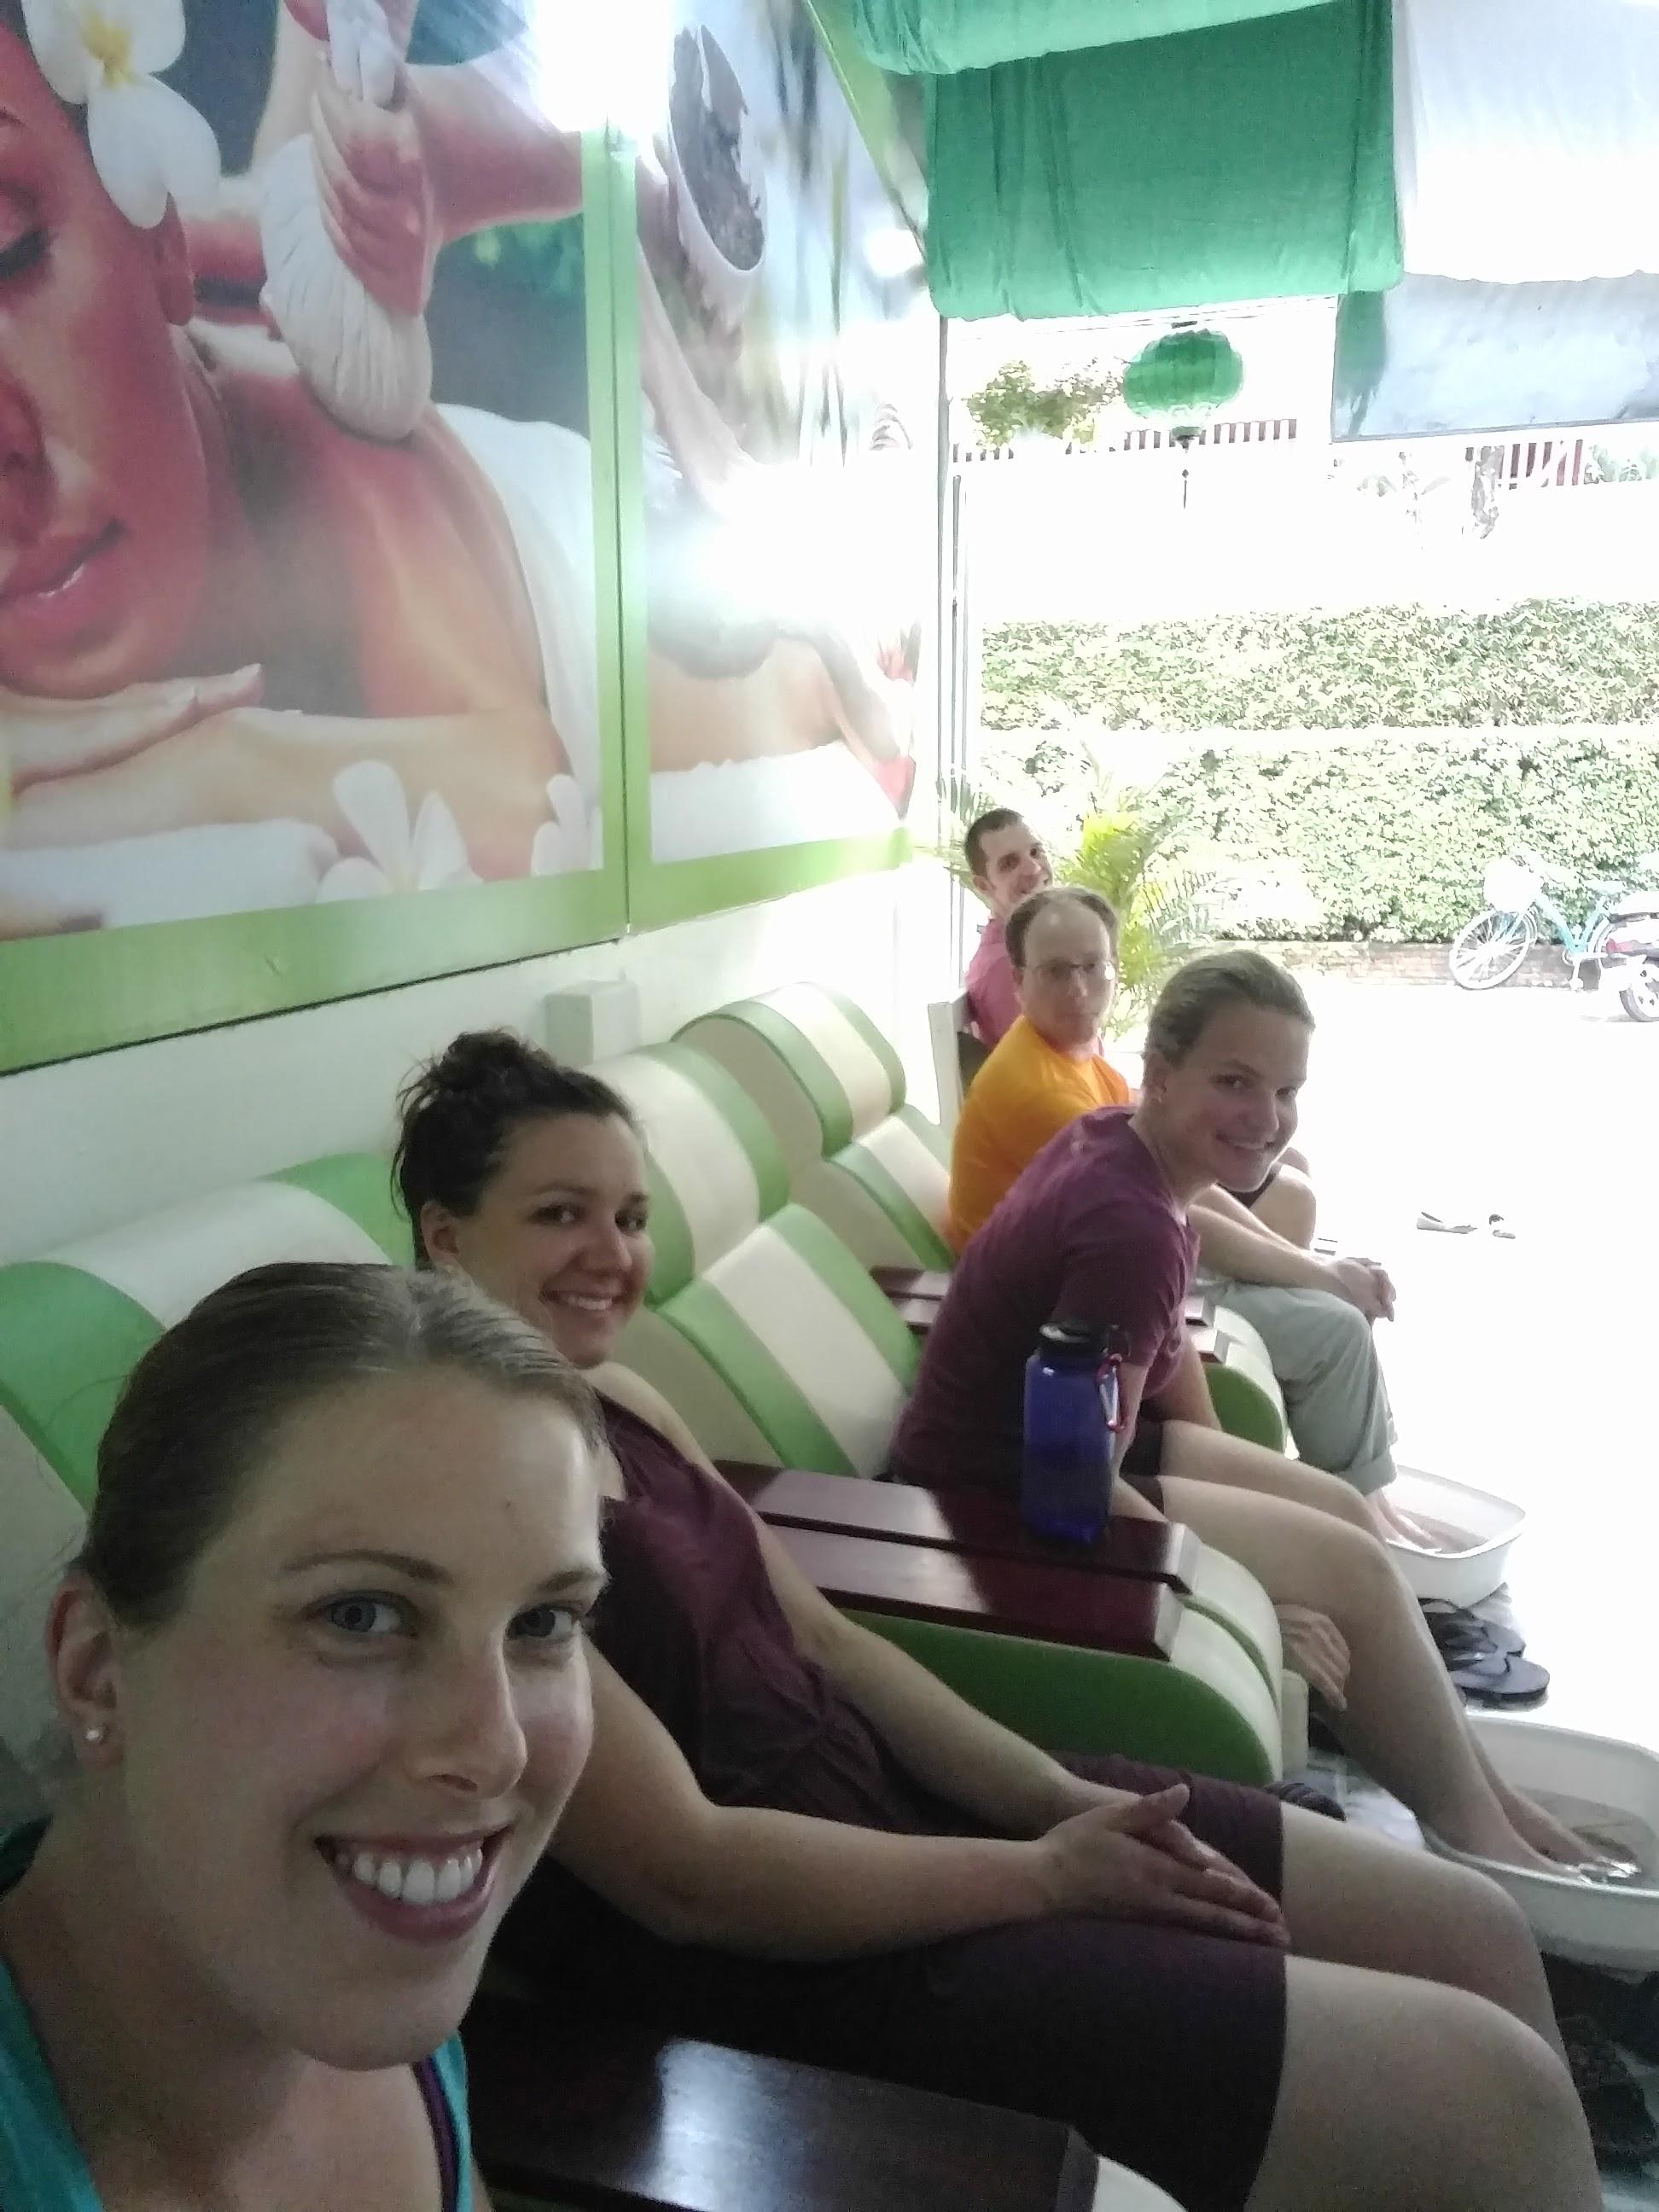 Pre-massage selfie